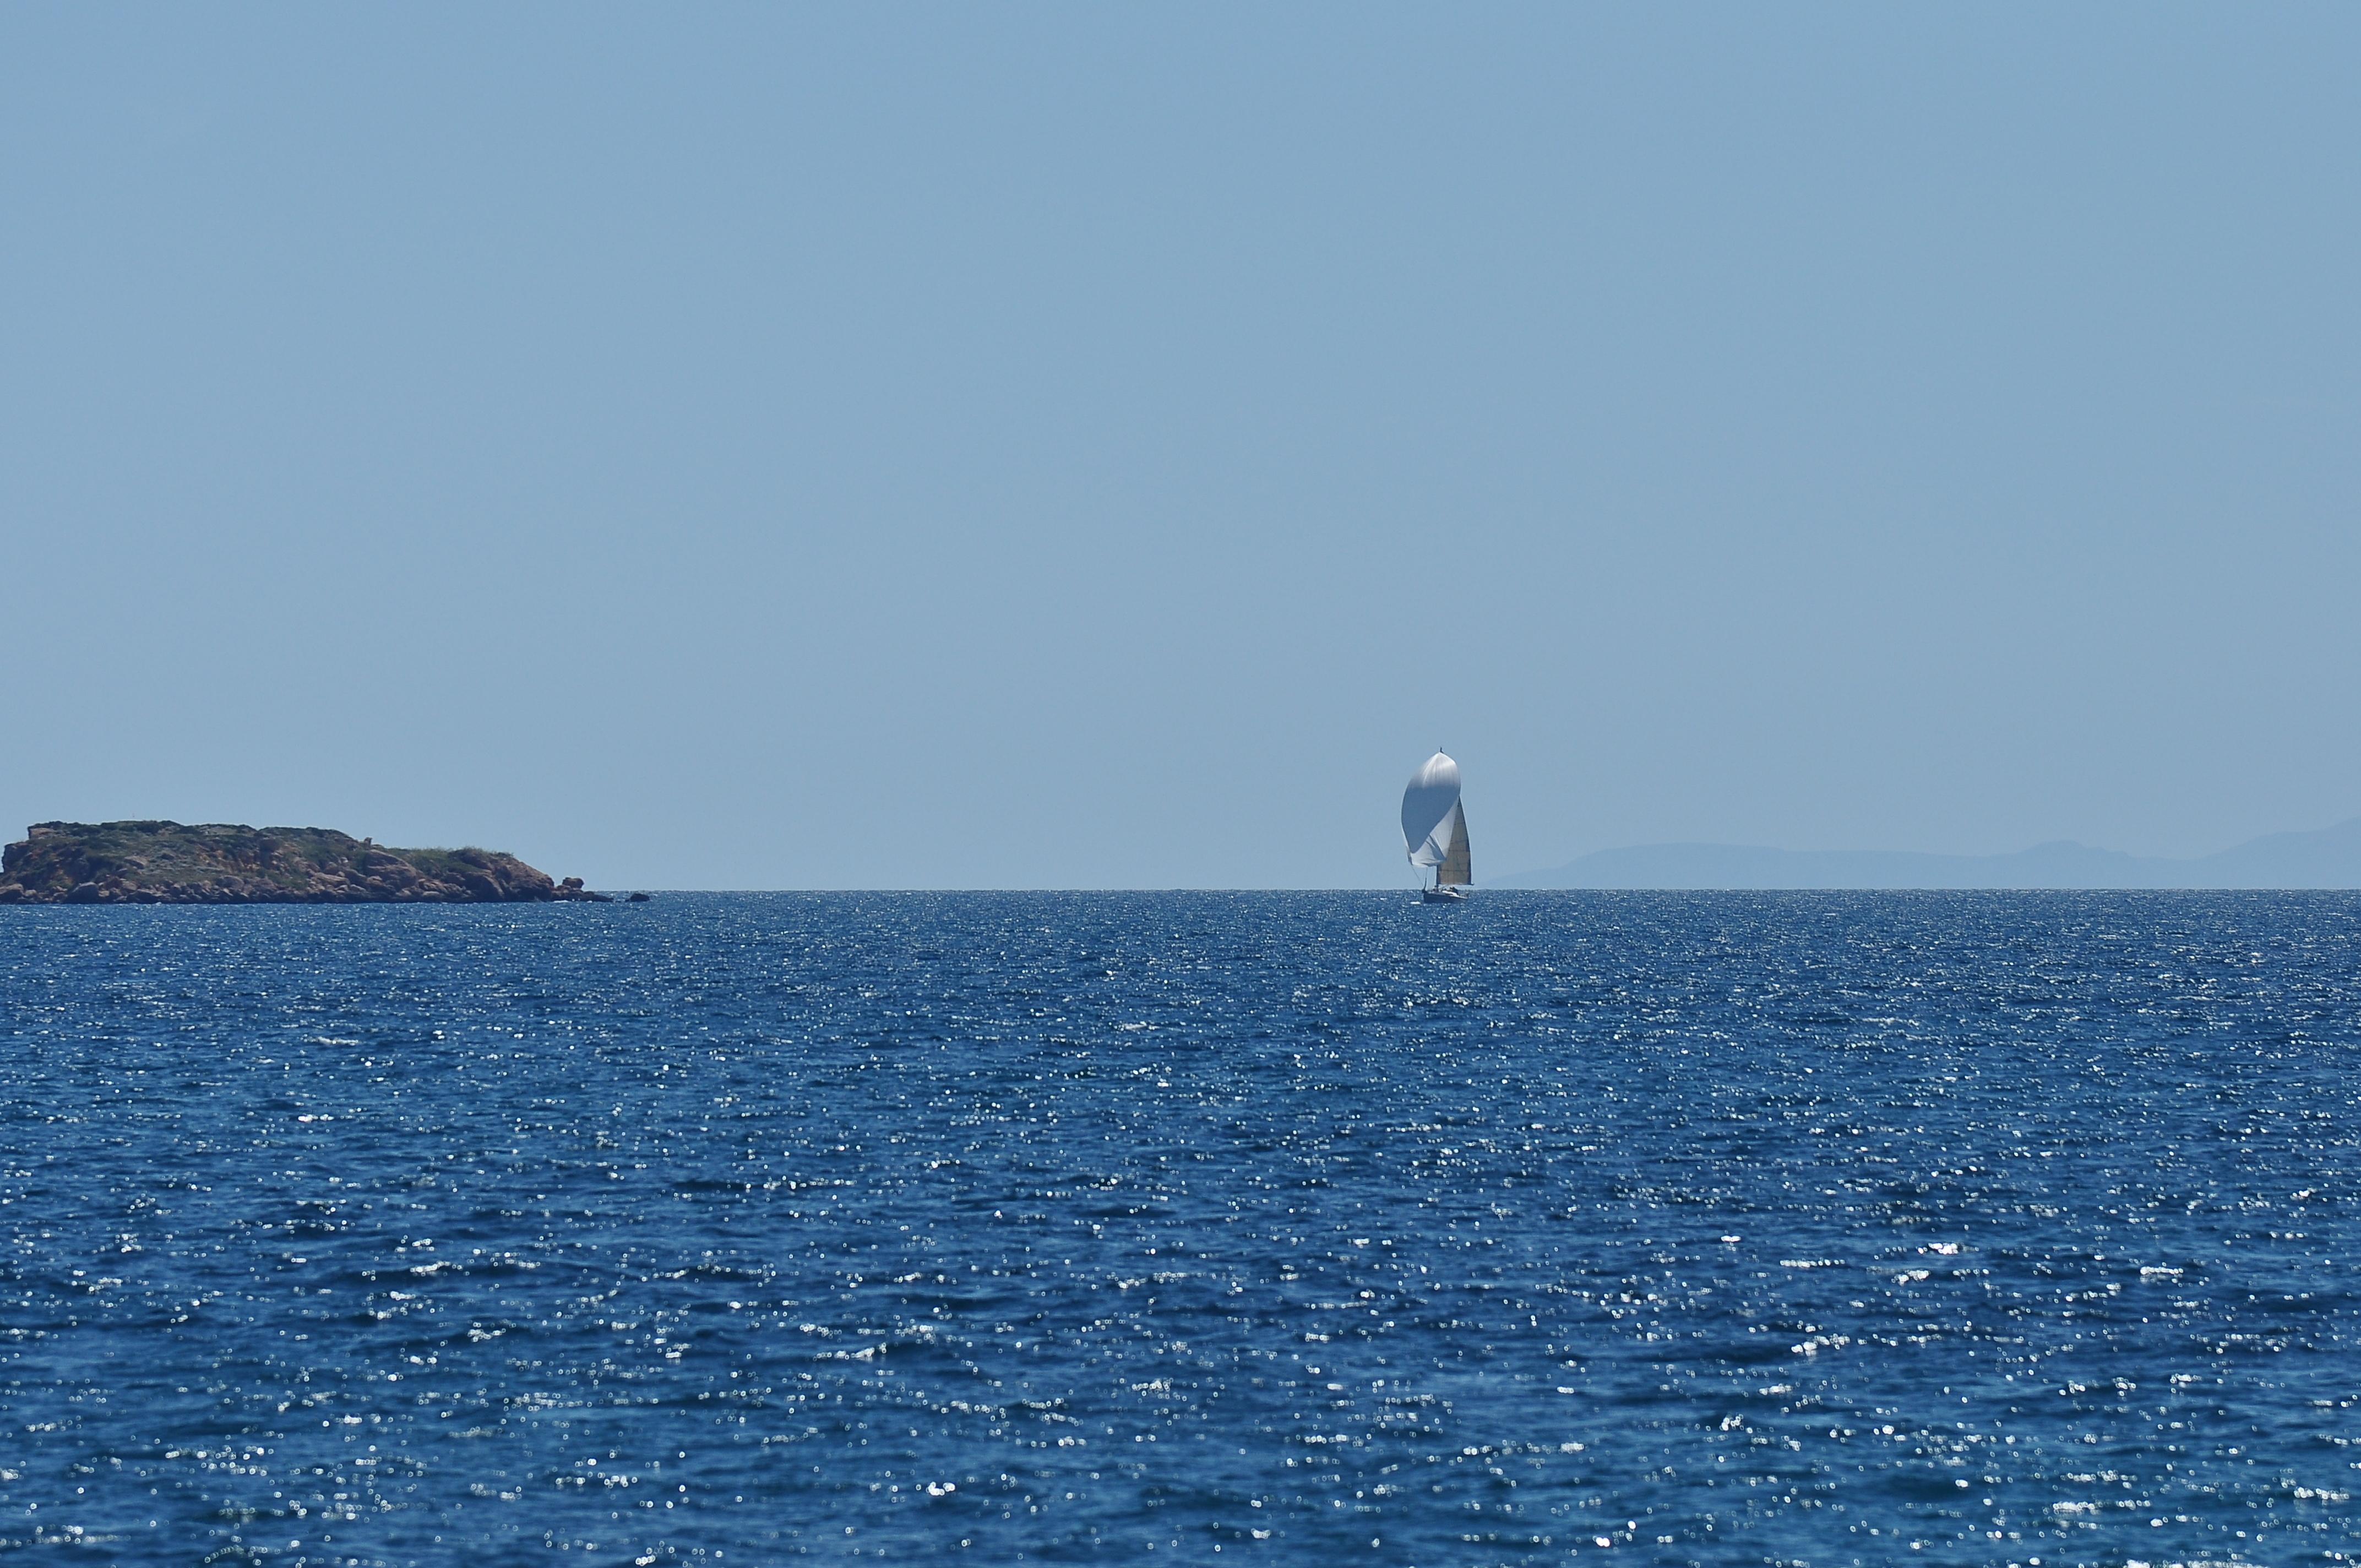 DSC 1083 - Ναυτικός Αθλητικός Όμιλος Βούλας - Τμήμα Ιστιοπλοΐας Ανοιχτής Θαλάσσης